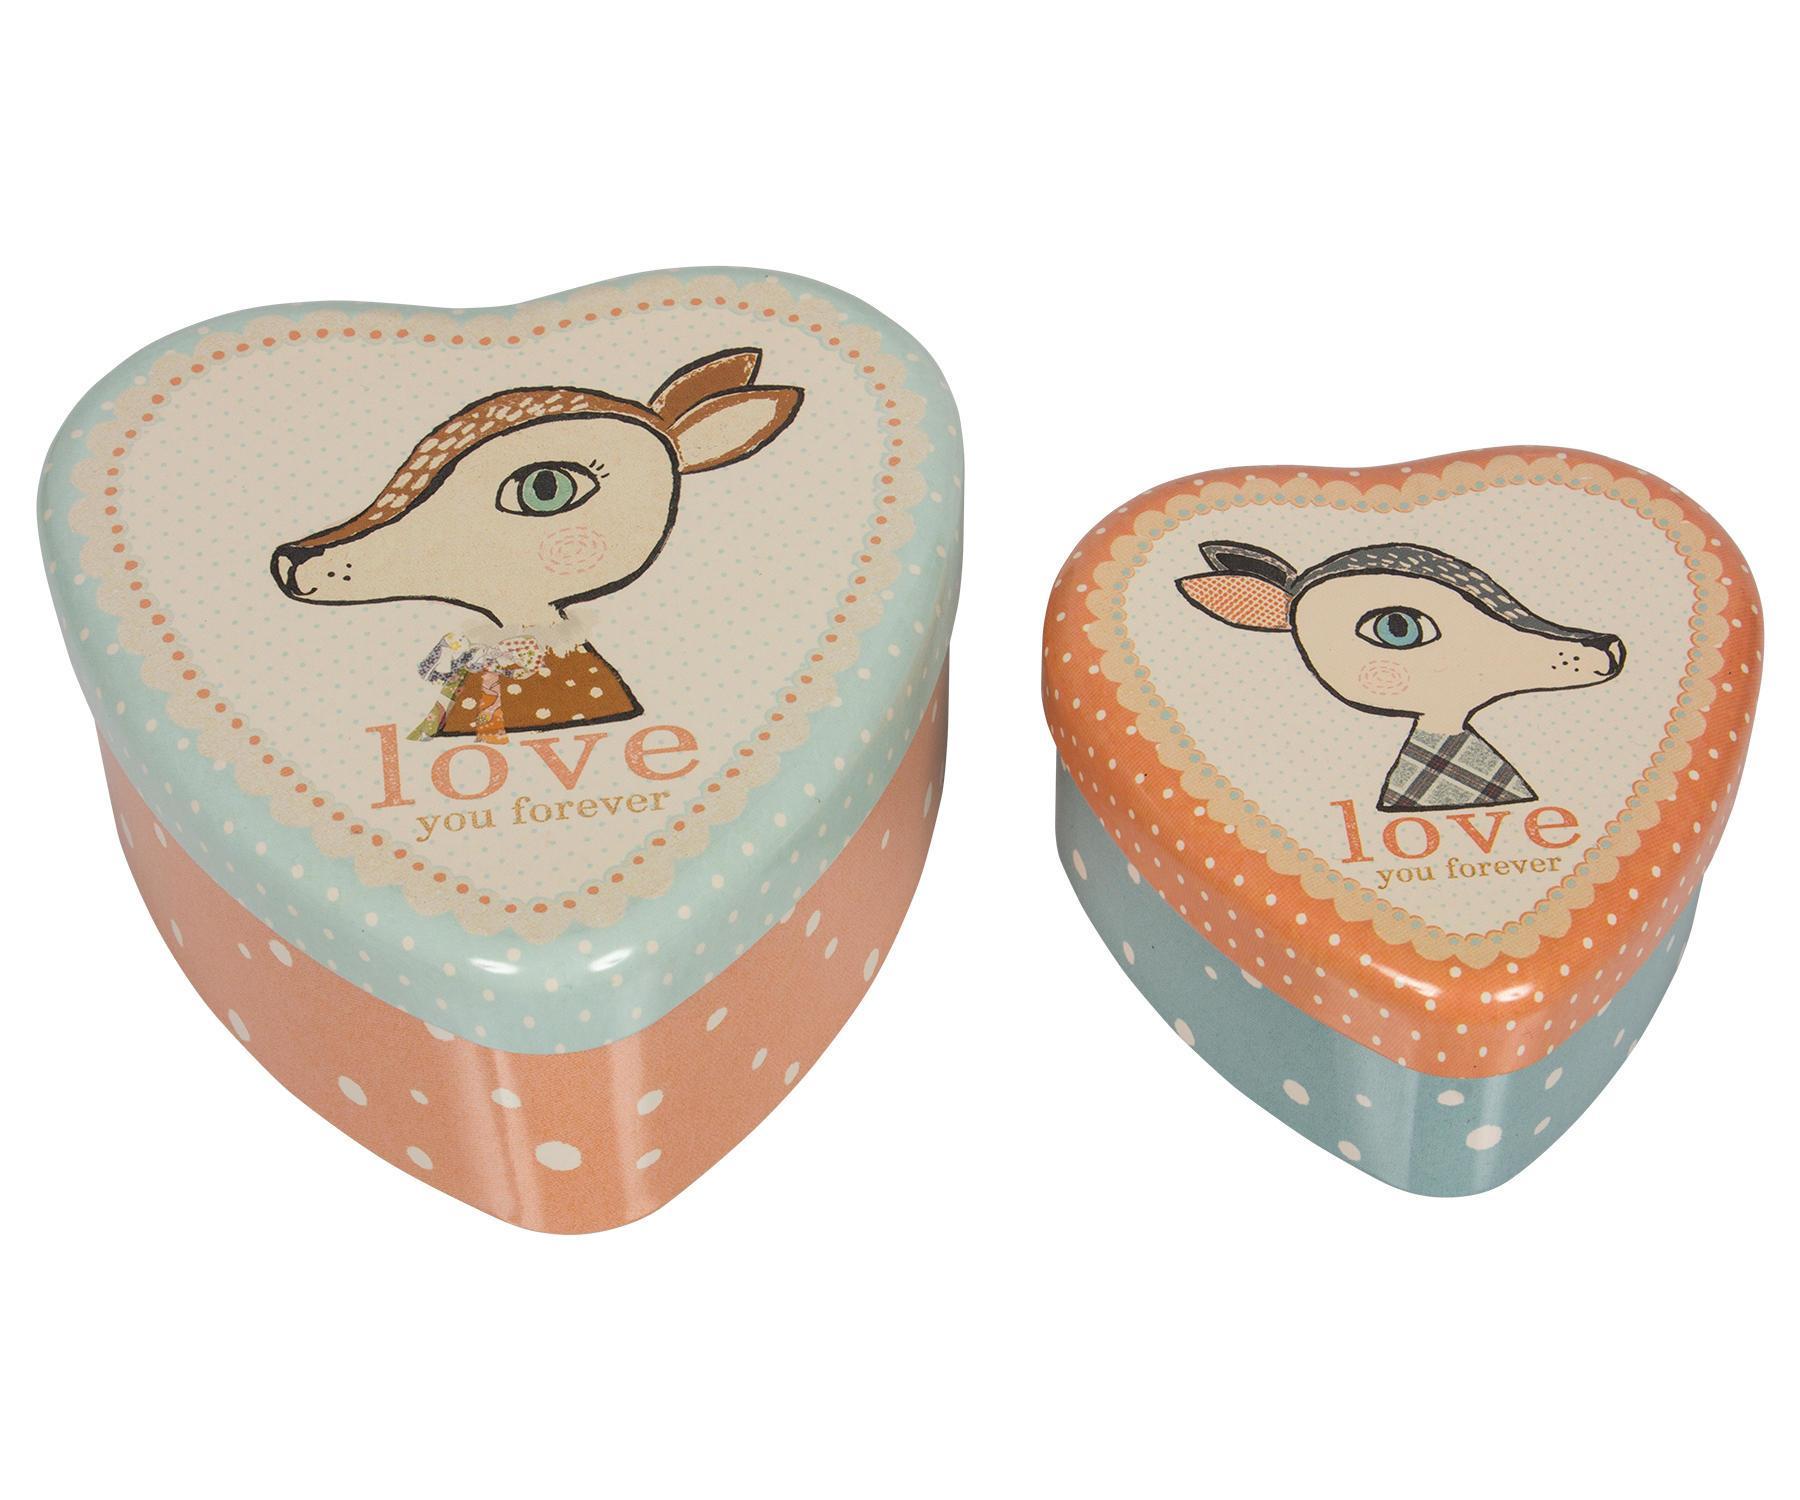 Maileg Plechové krabičky ve tvaru srdce Bambi - set 2 ks, červená barva, modrá barva, kov